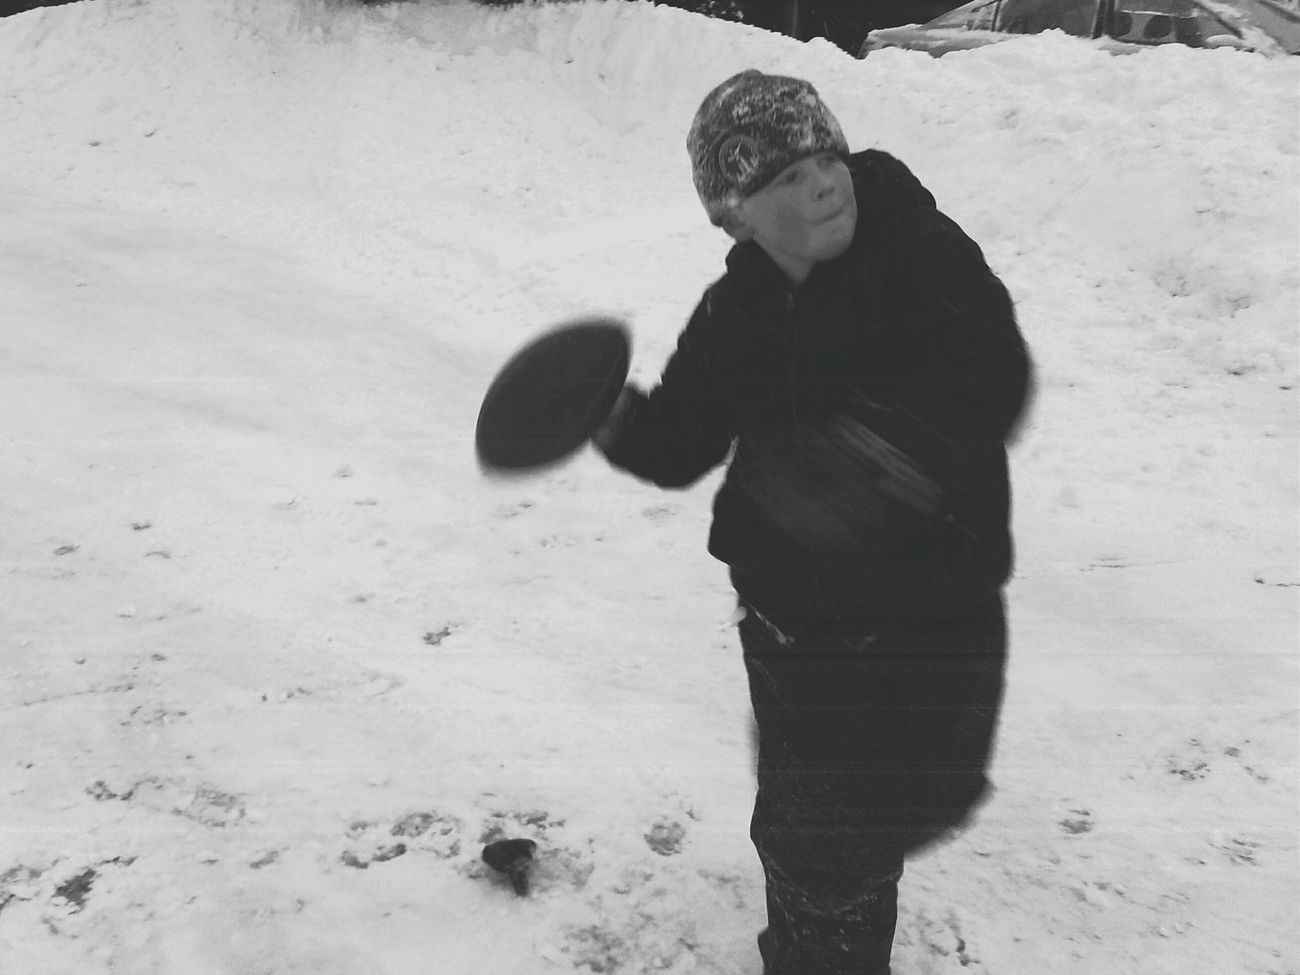 Snow ❄ Blackandwhite Photography Godeep Football Winter Wonderland Enjoying Life